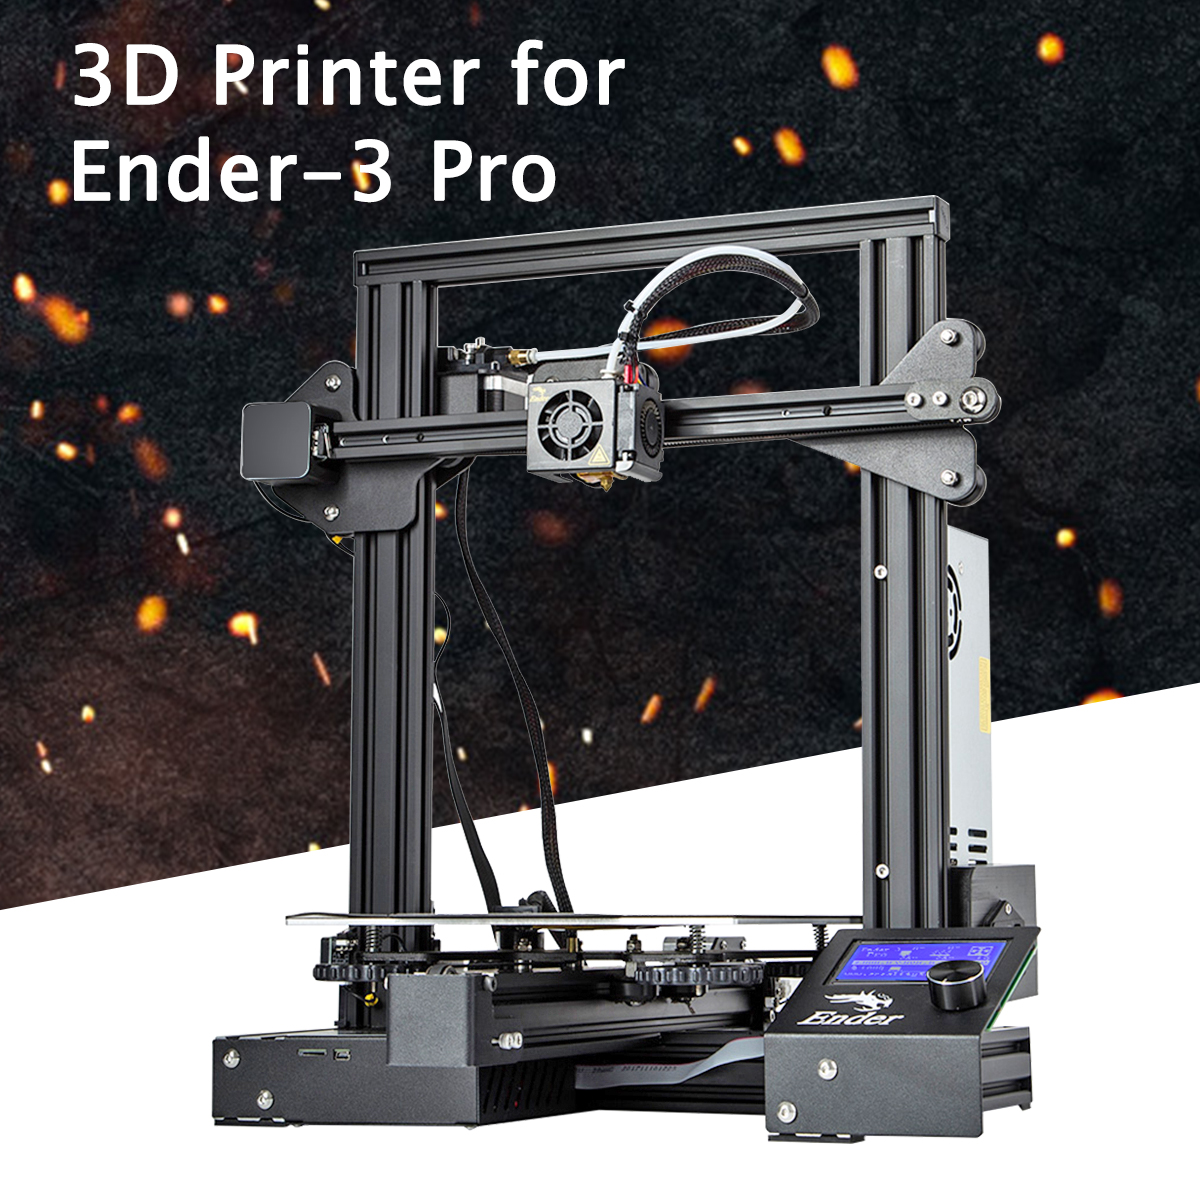 Ender-3 Pro V-slot Pru sa I3 bricolage 3D kit imprimante 220x220x250mm Impression Taille Avec plate-Forme magnétique Autocollant